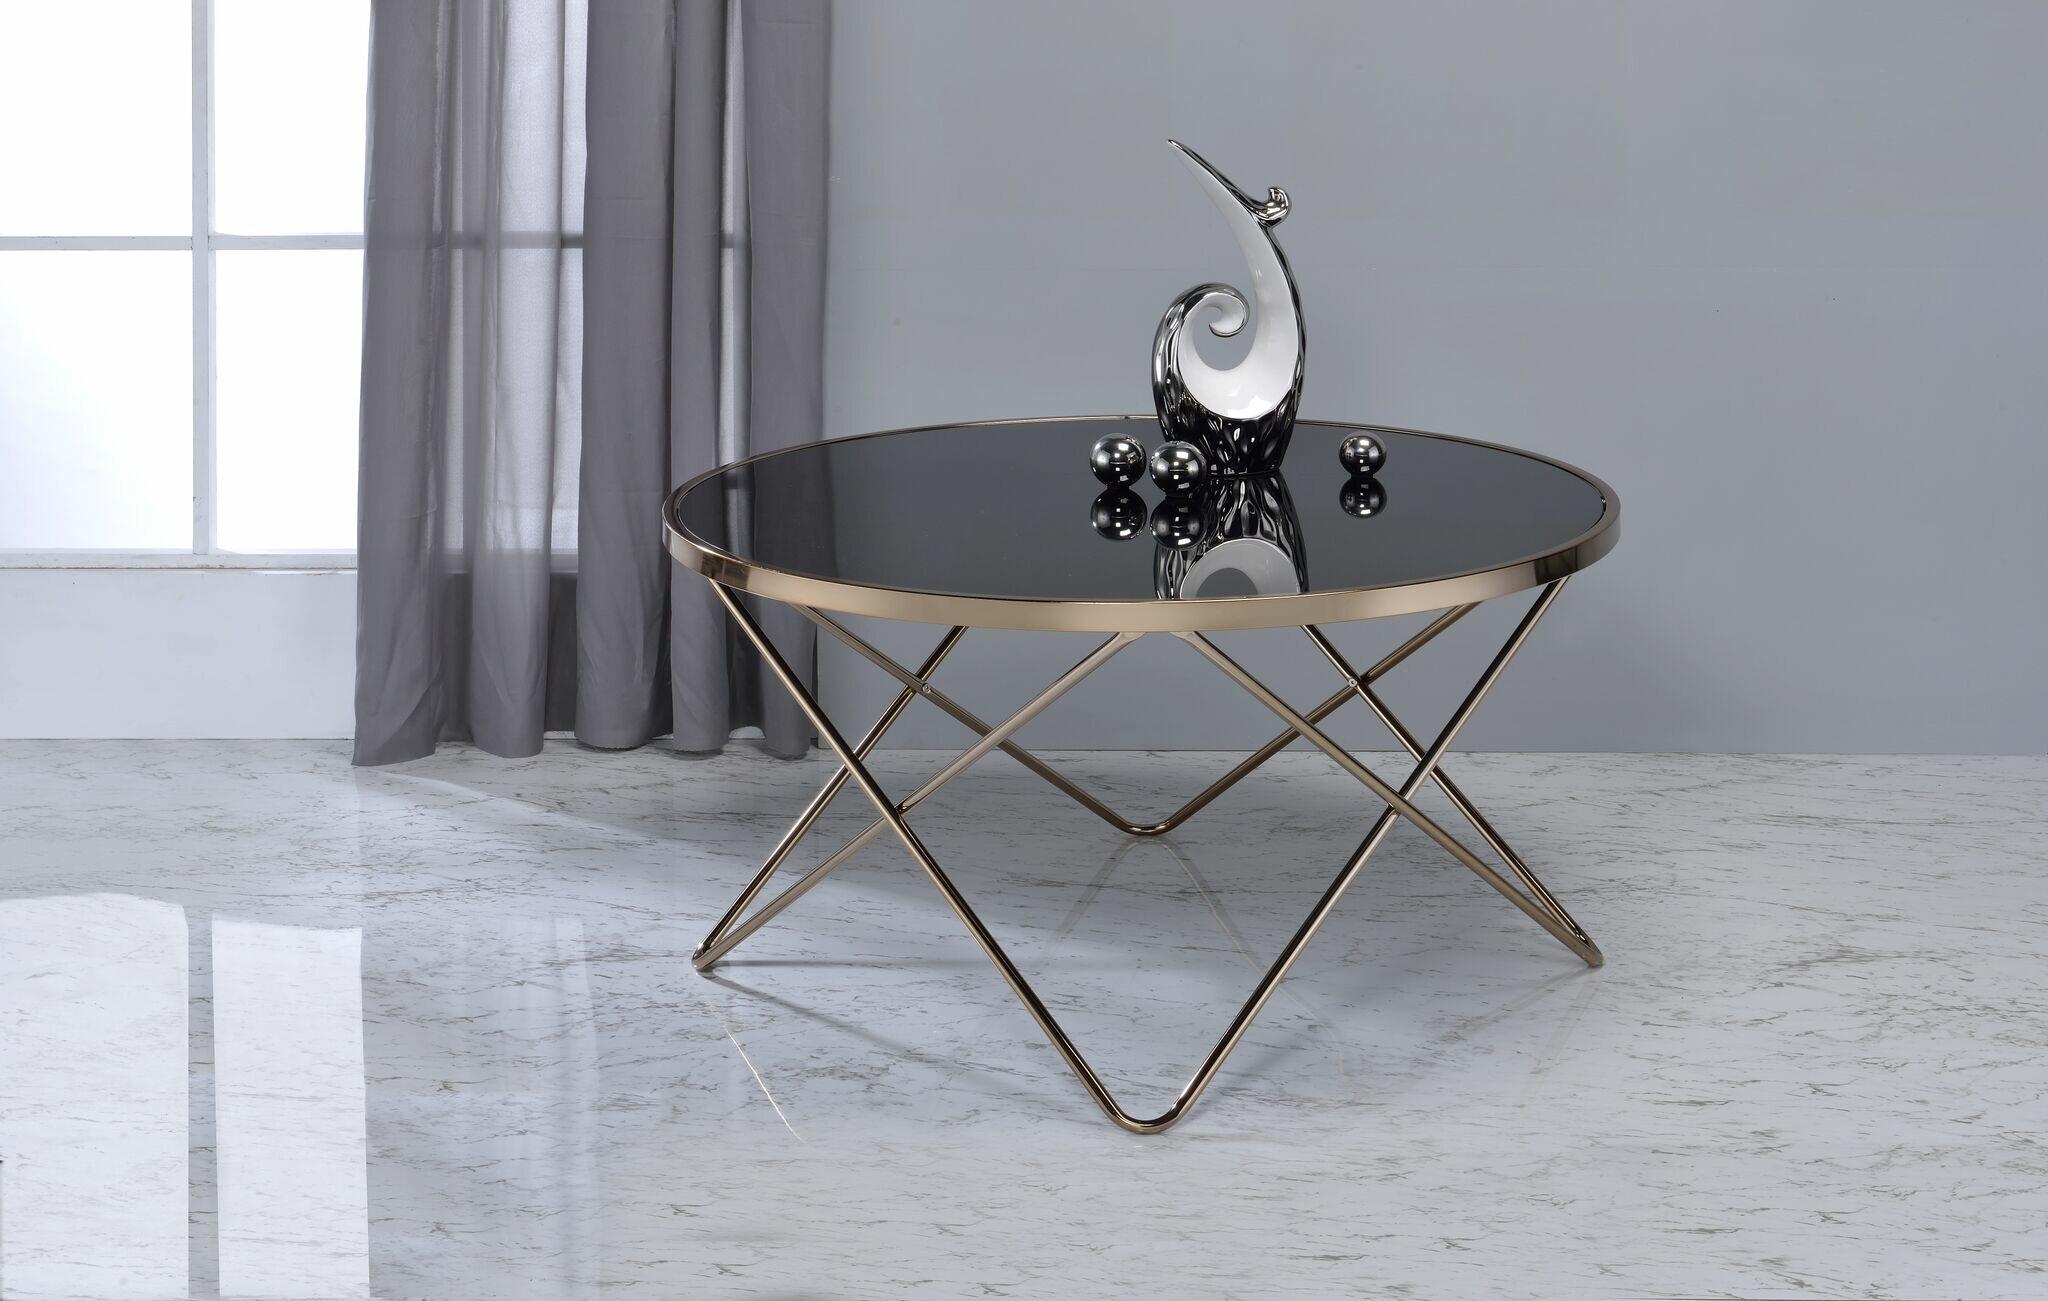 Astounding Smyrna Contemporary Round Living Room Coffee Table Bralicious Painted Fabric Chair Ideas Braliciousco